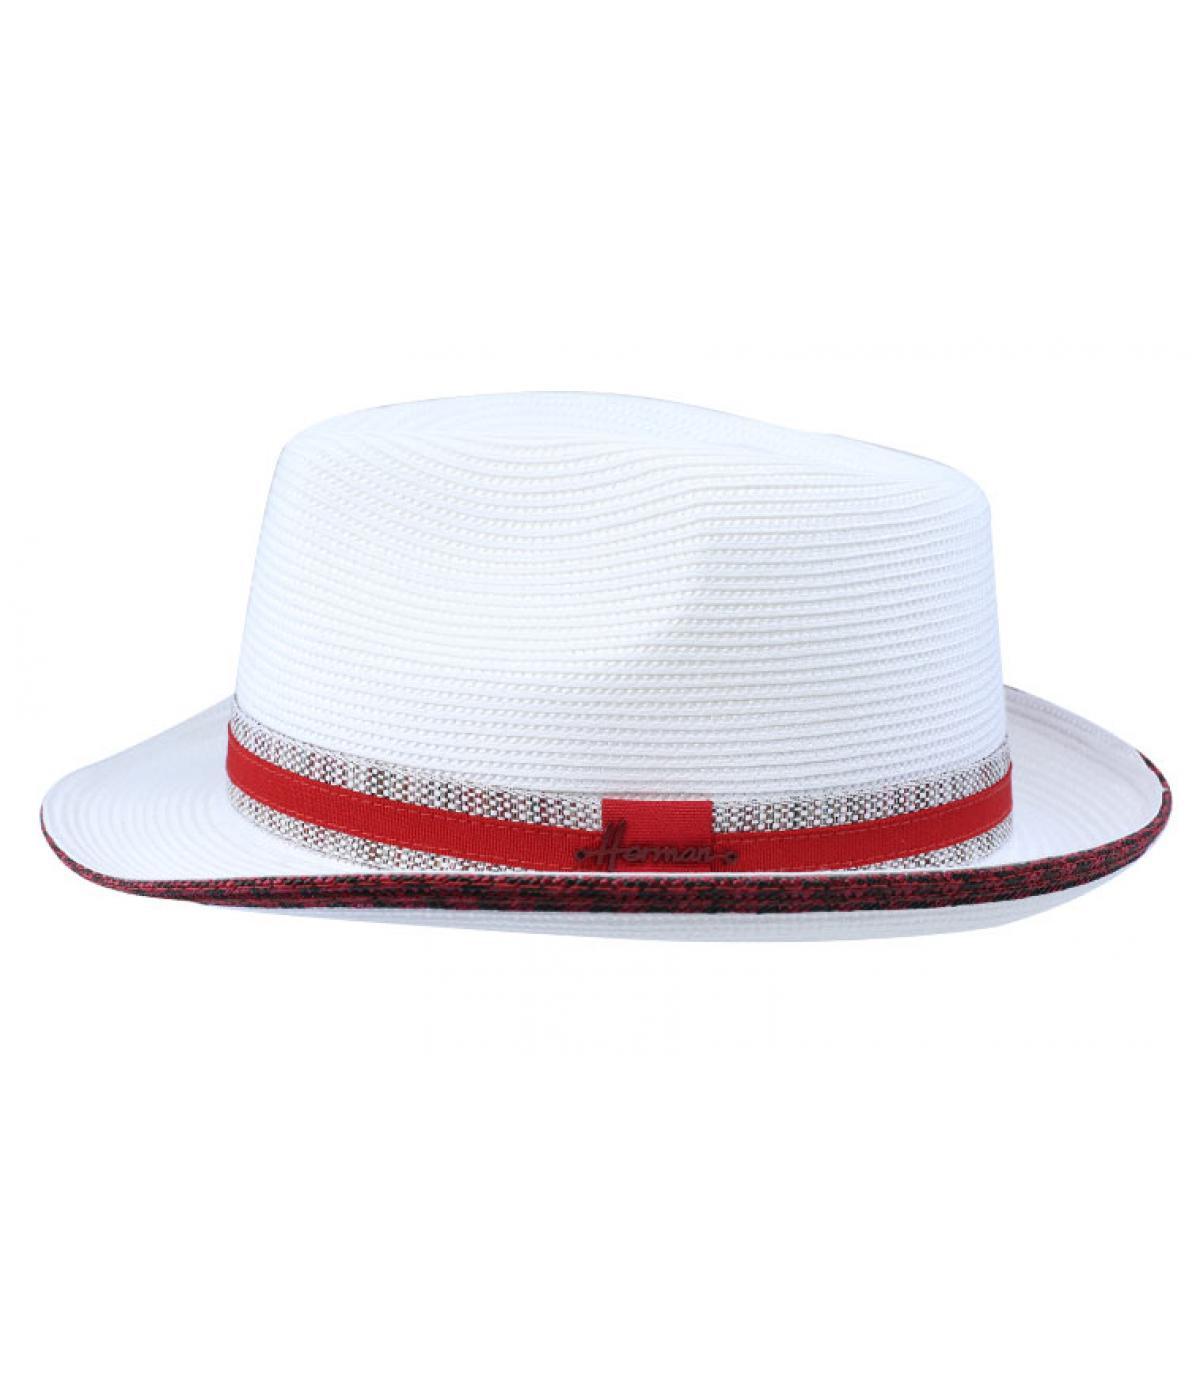 weißer Hut rotes Hutband